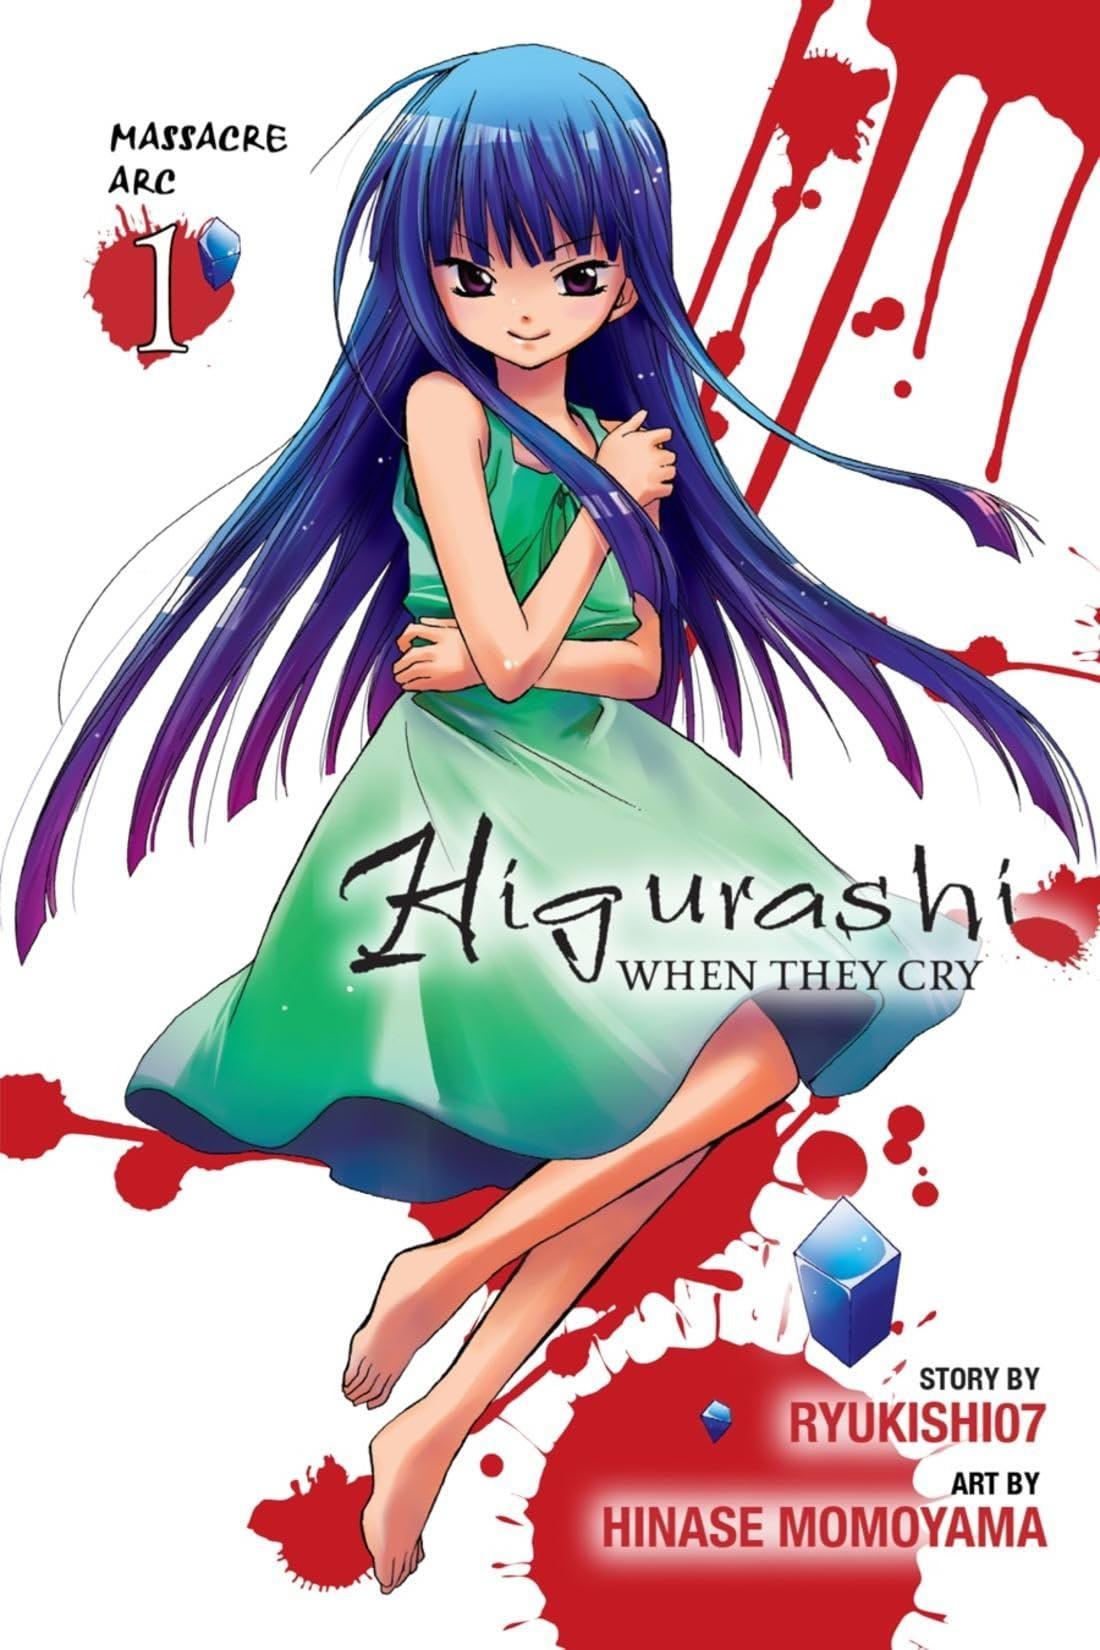 Higurashi When They Cry Vol. 1: Massacre Arc